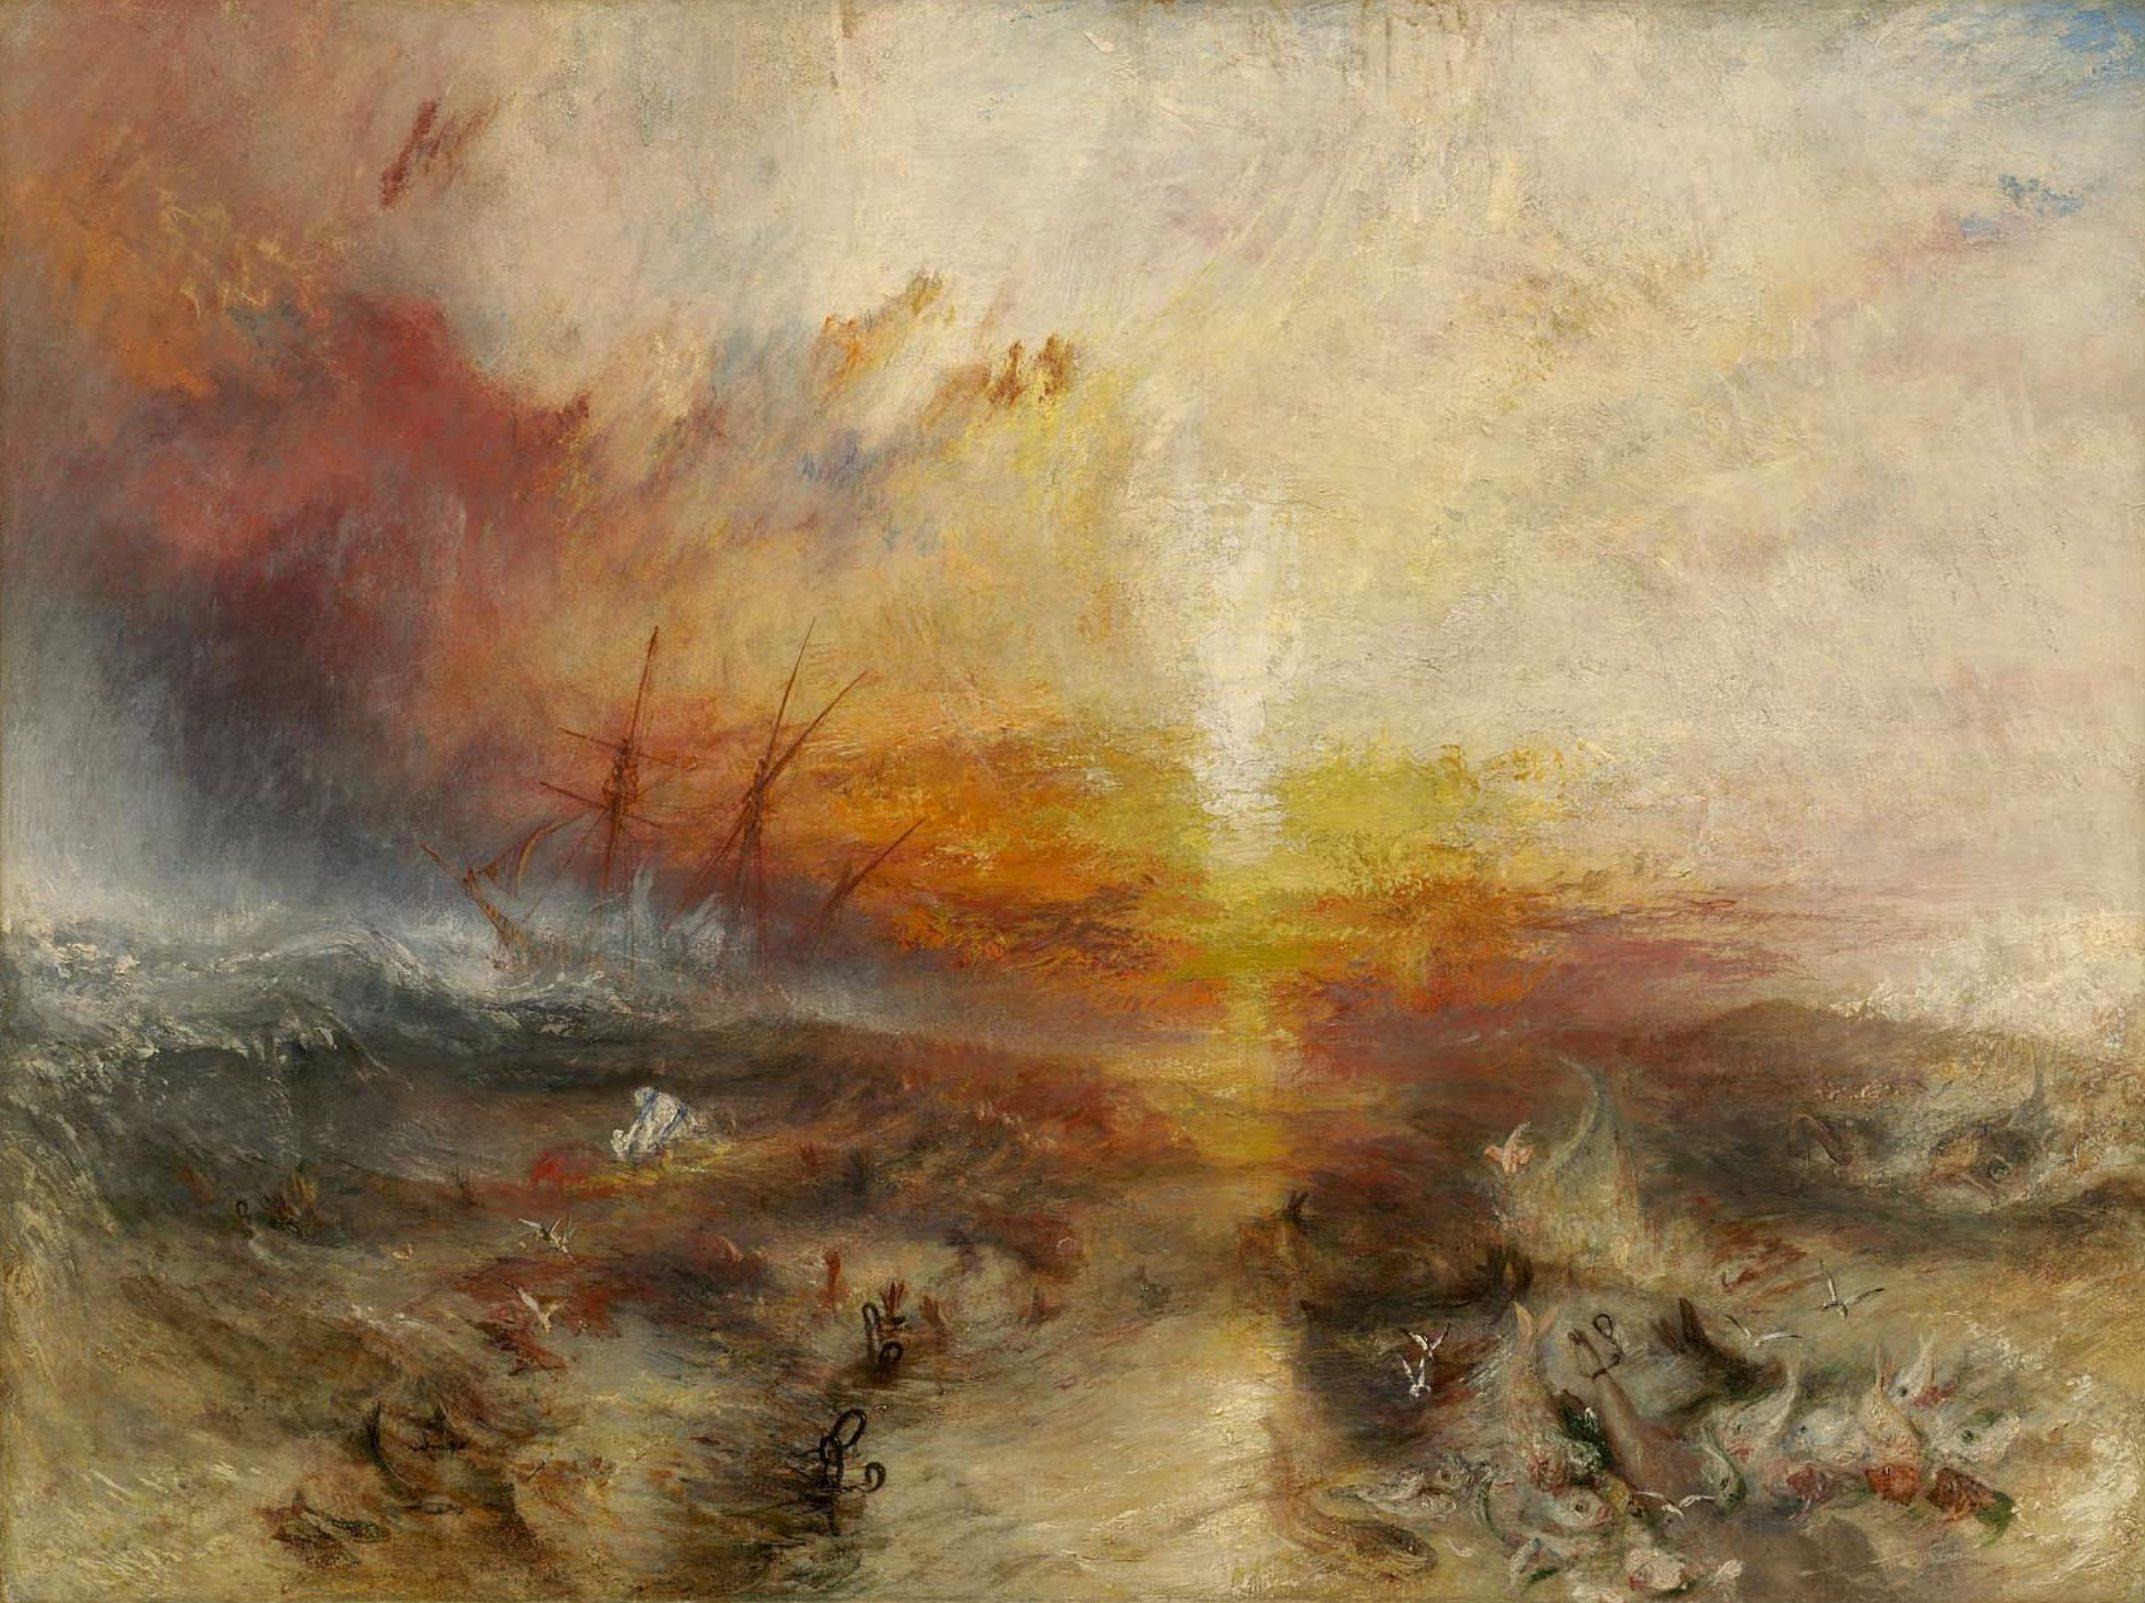 William TURNER - The Slave Ship, love, sun, insight, coaching